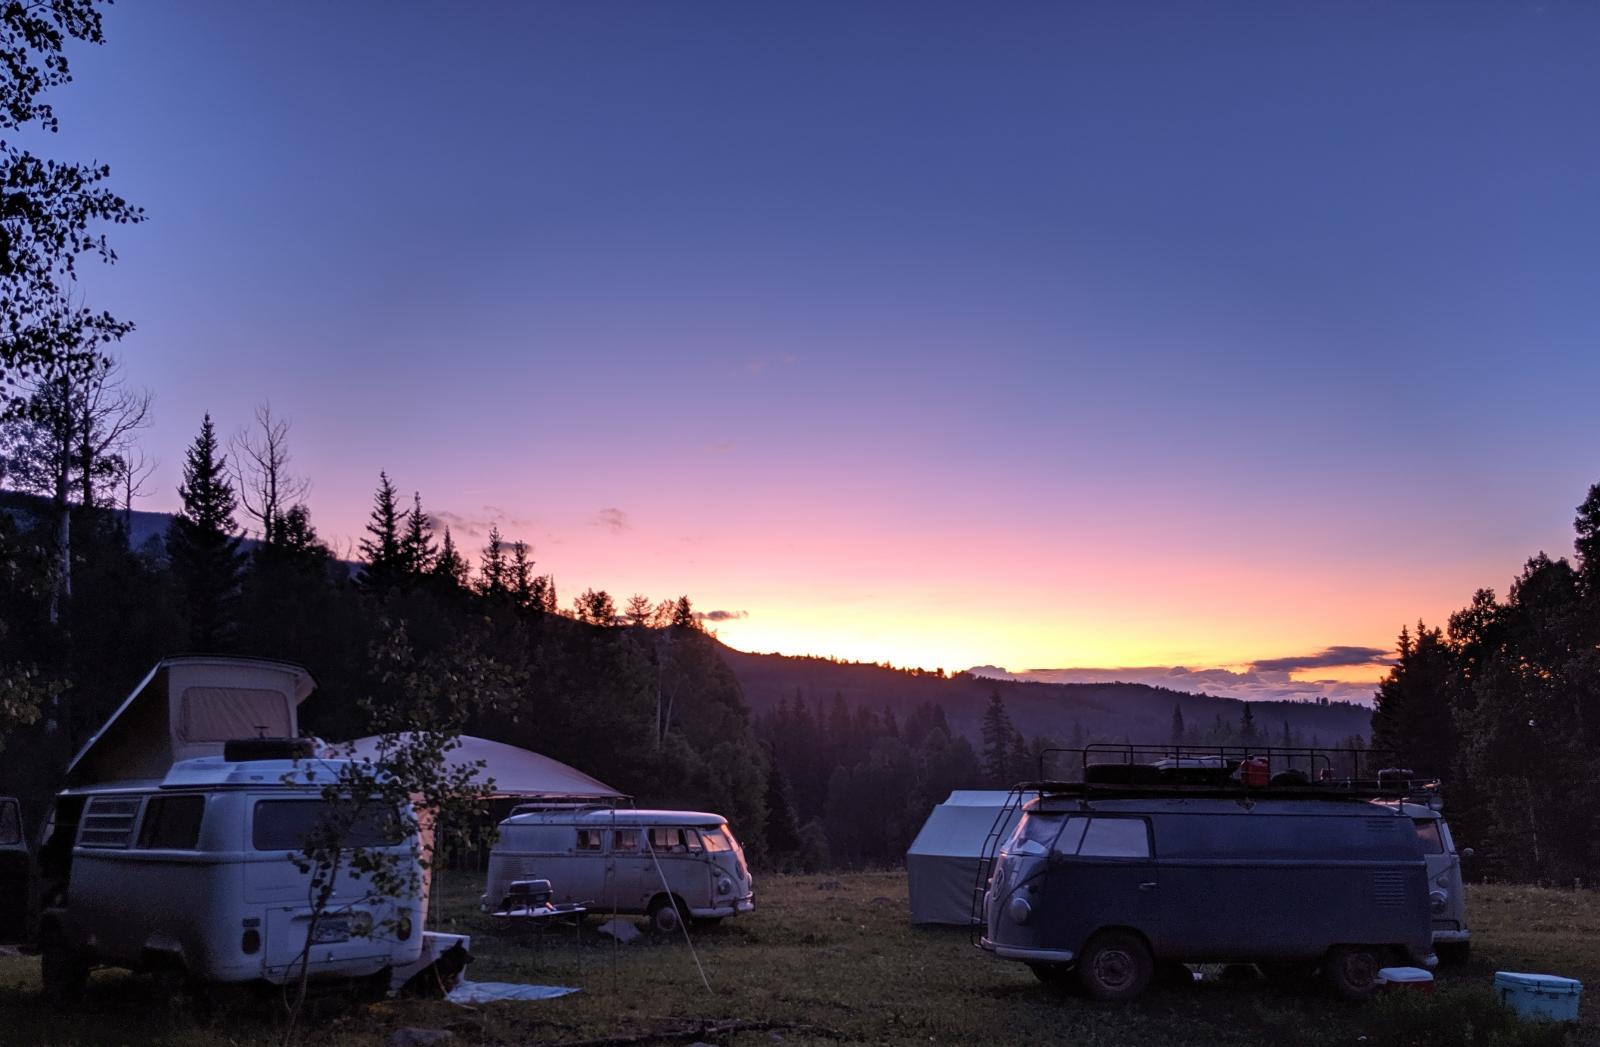 4CORE Camping